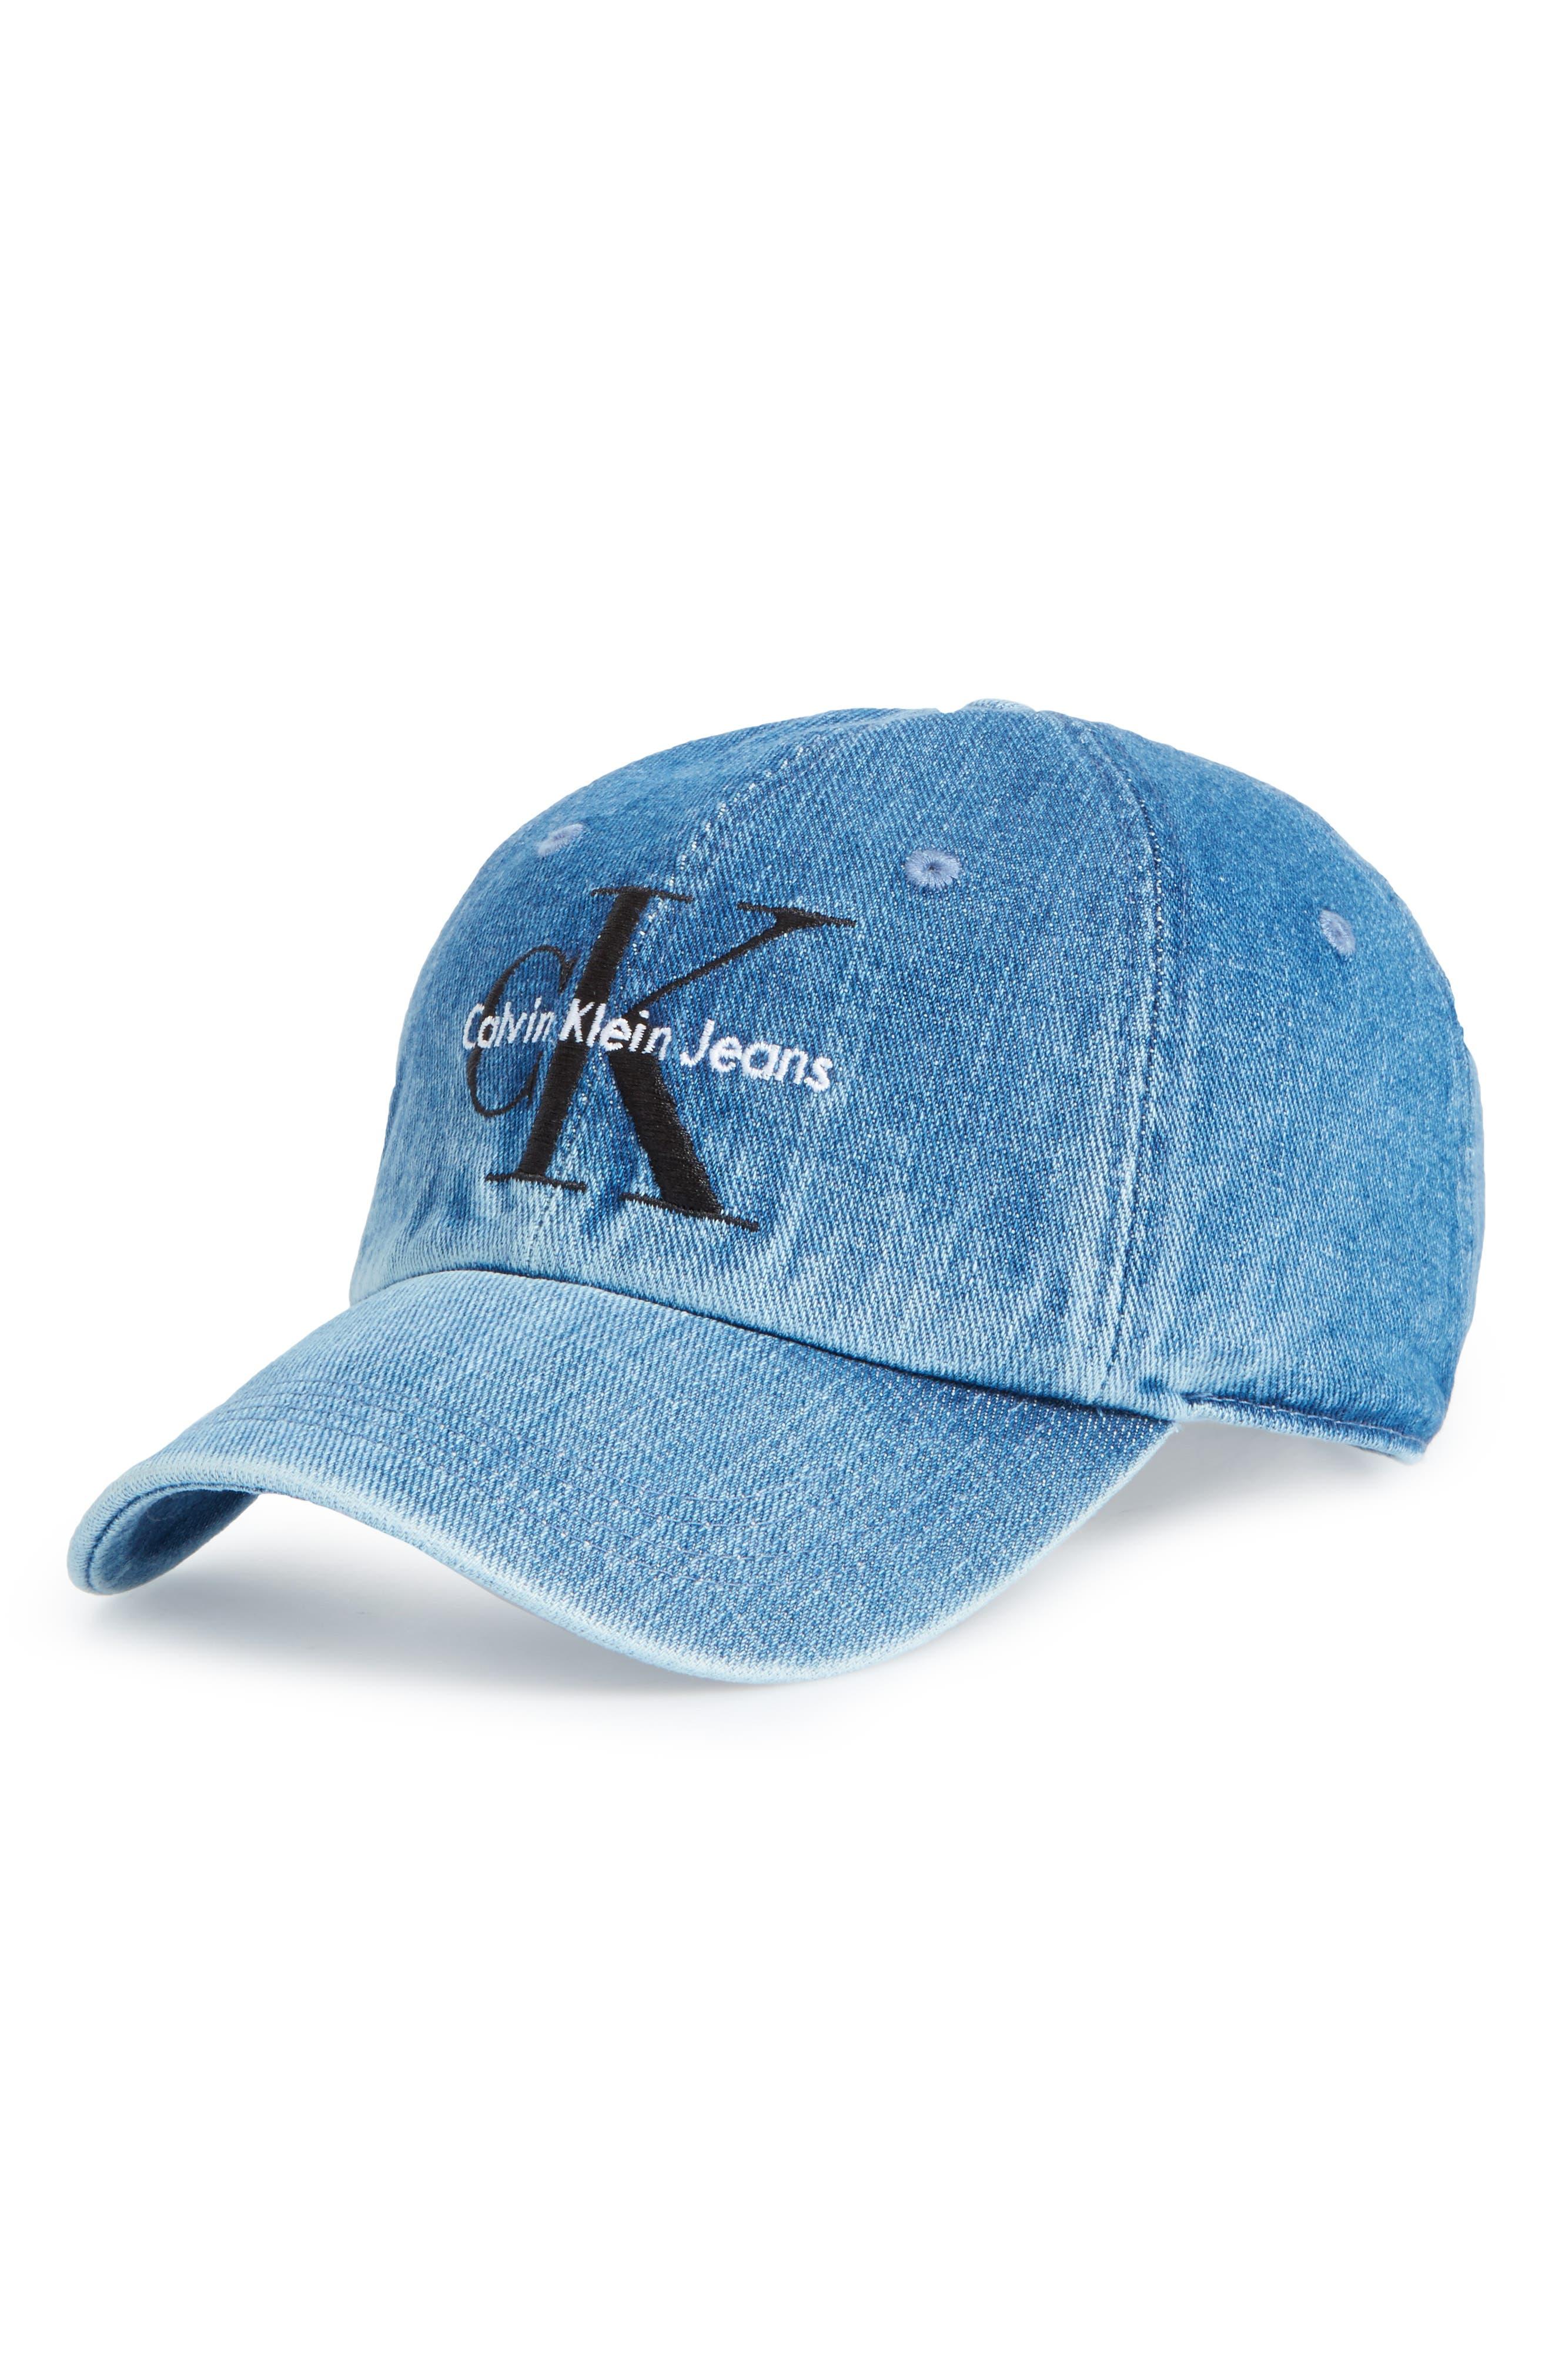 Calvin Klein CK Jeans Ball Cap,                         Main,                         color, Stone Wash